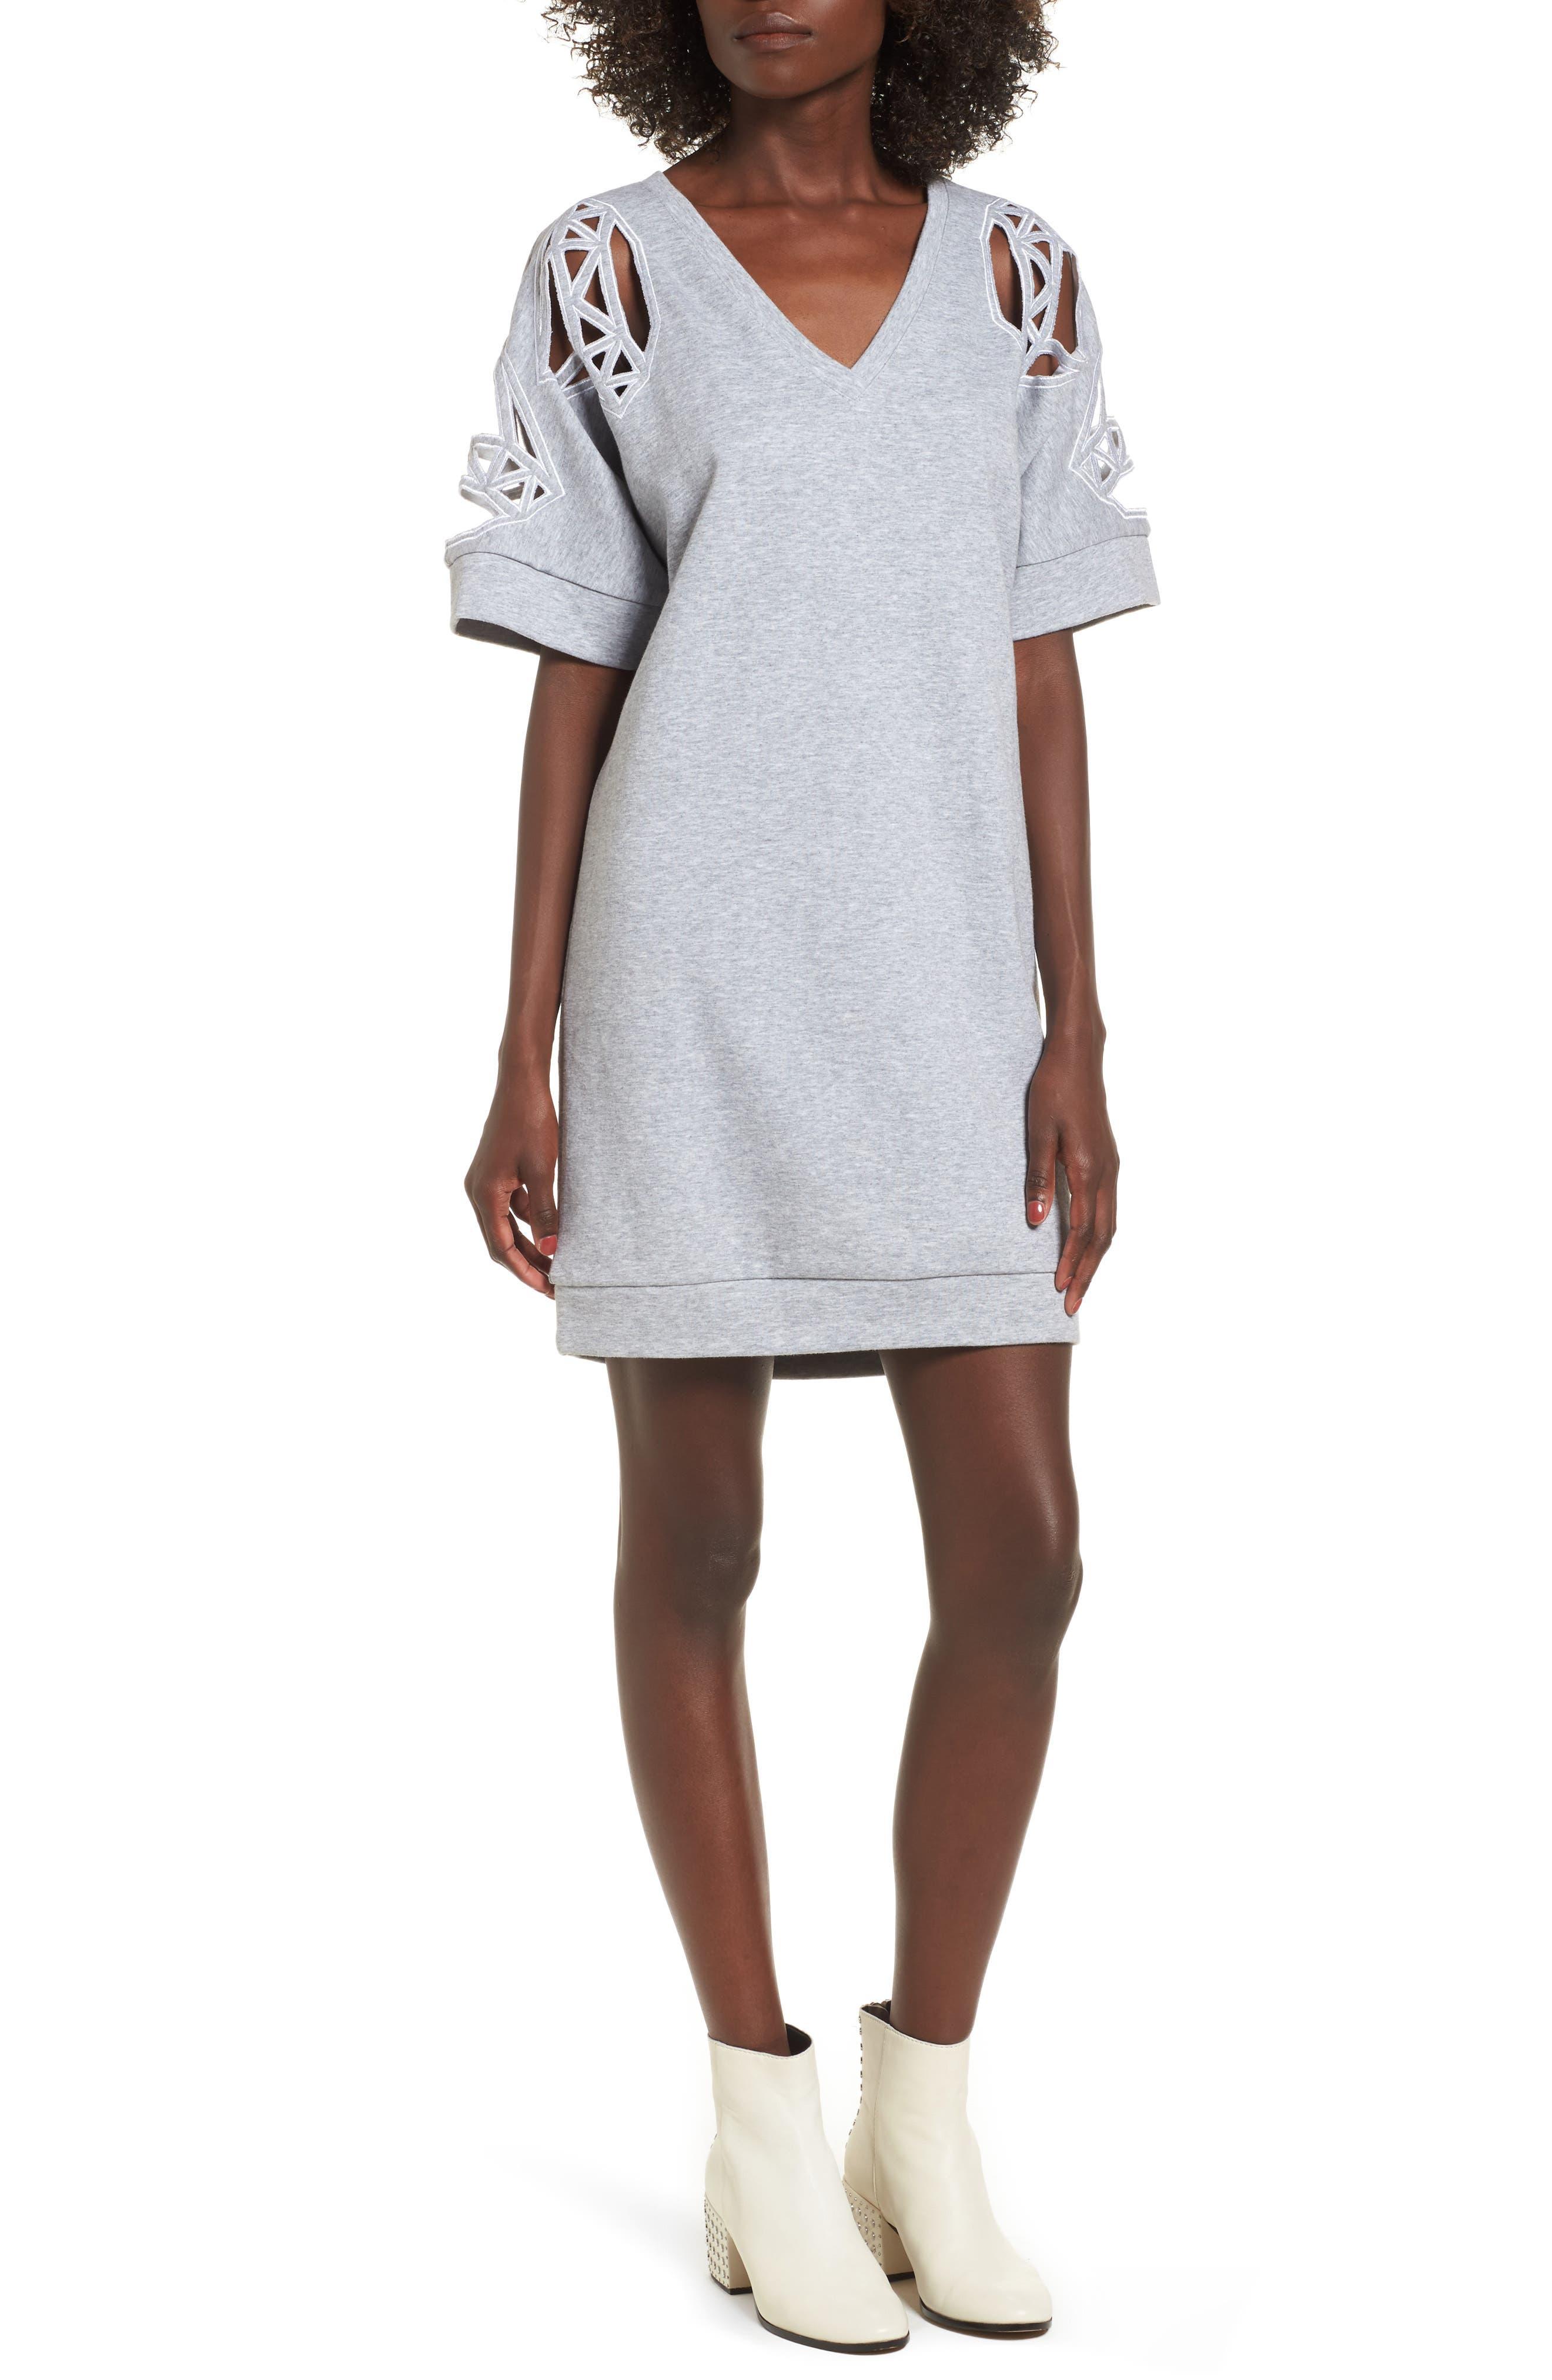 Daffic Sweatshirt Dress,                             Main thumbnail 1, color,                             020